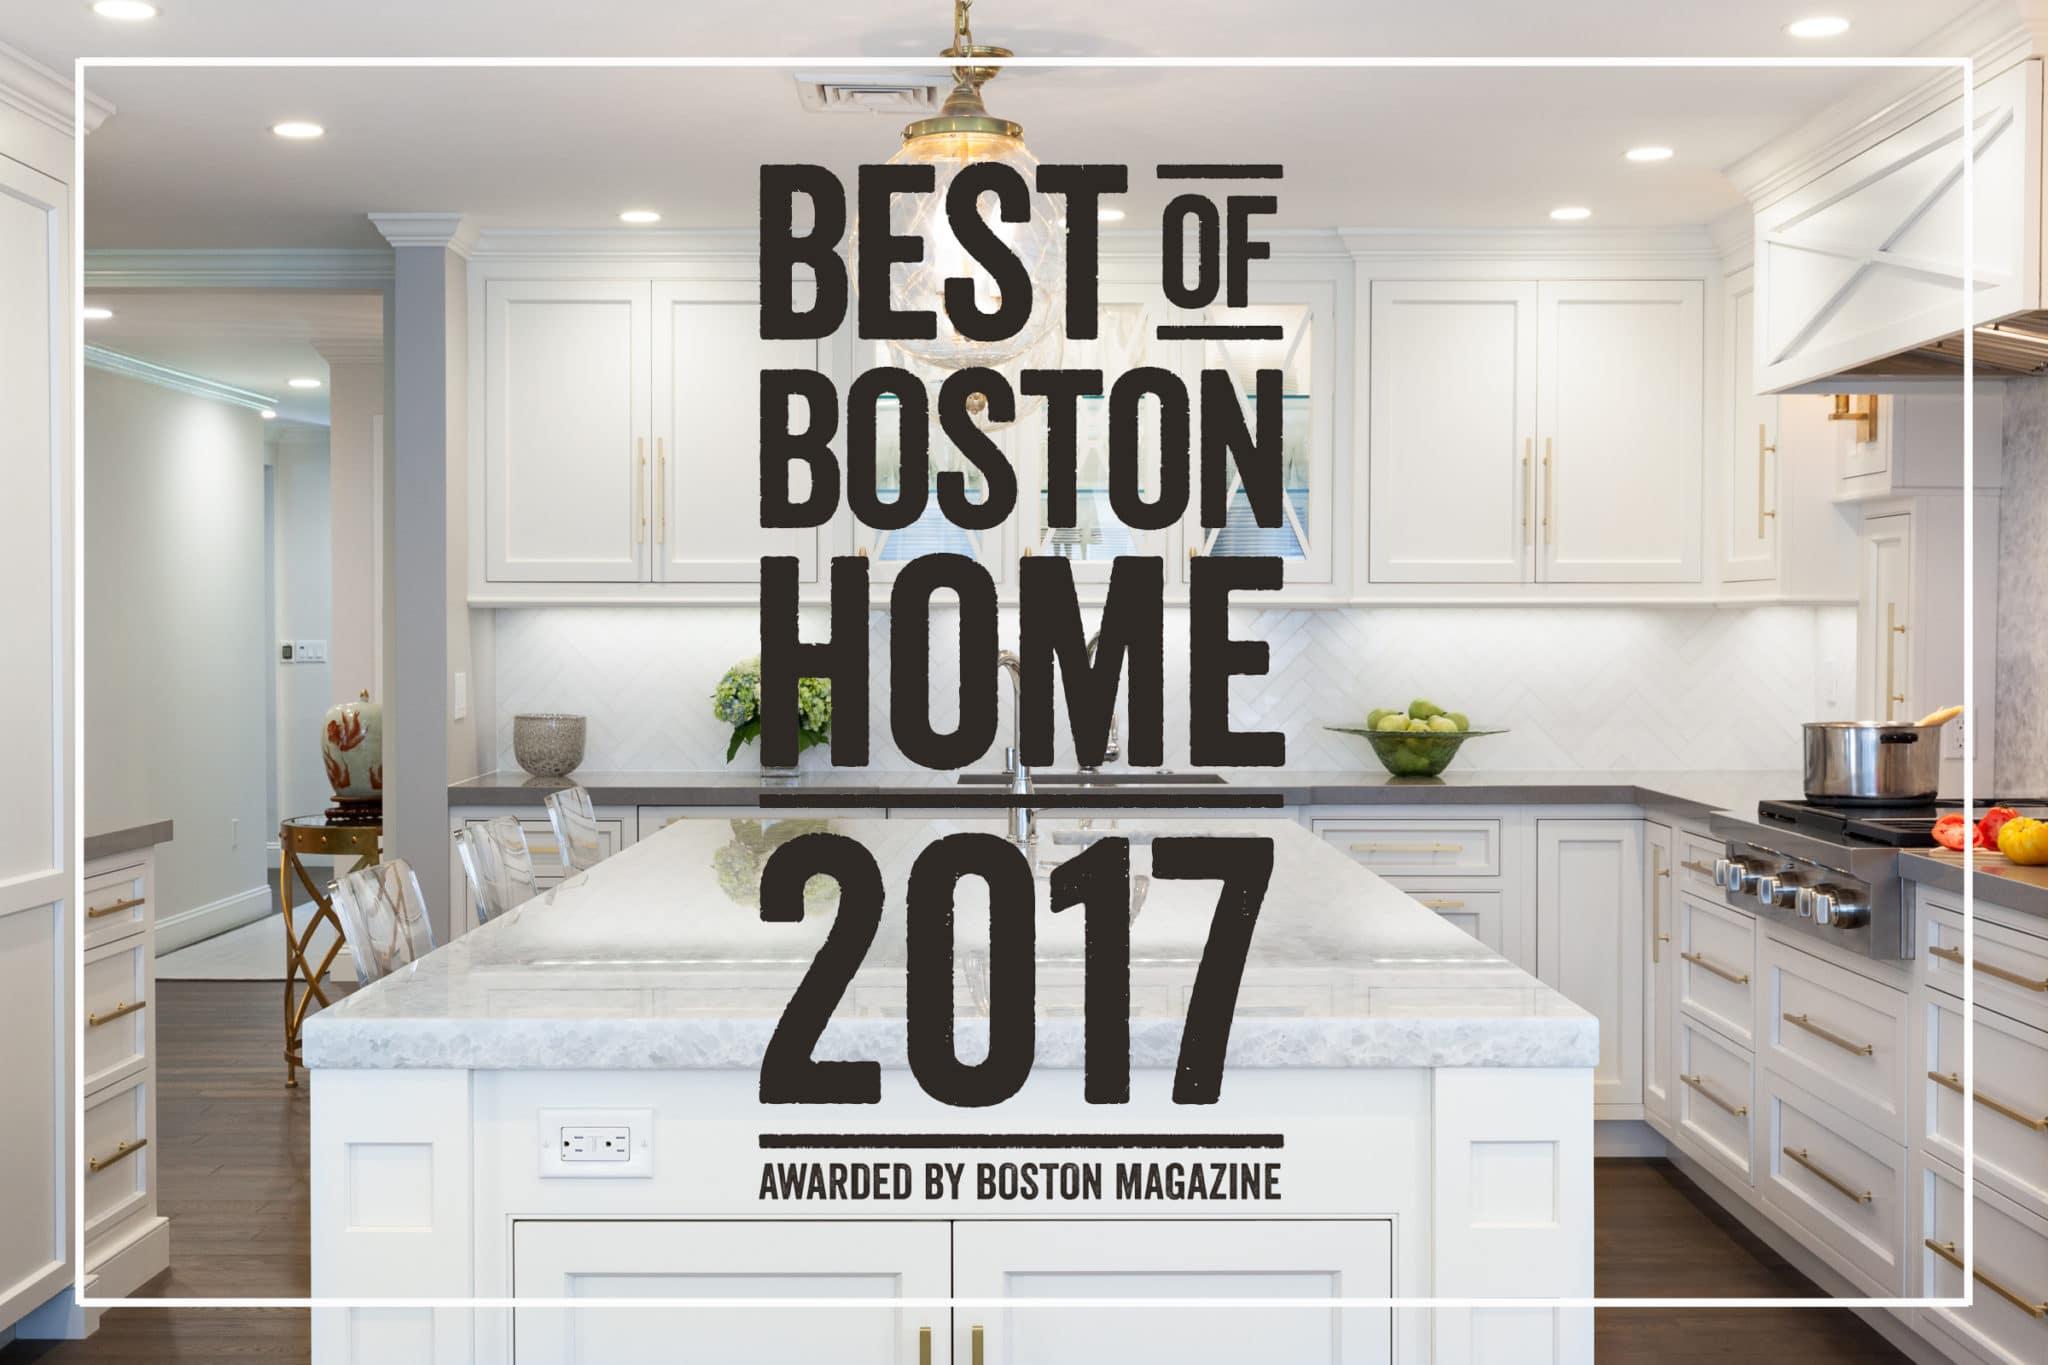 metcabinet kitchen cabinets and countertops Metropolitan Wins Best of Boston Award